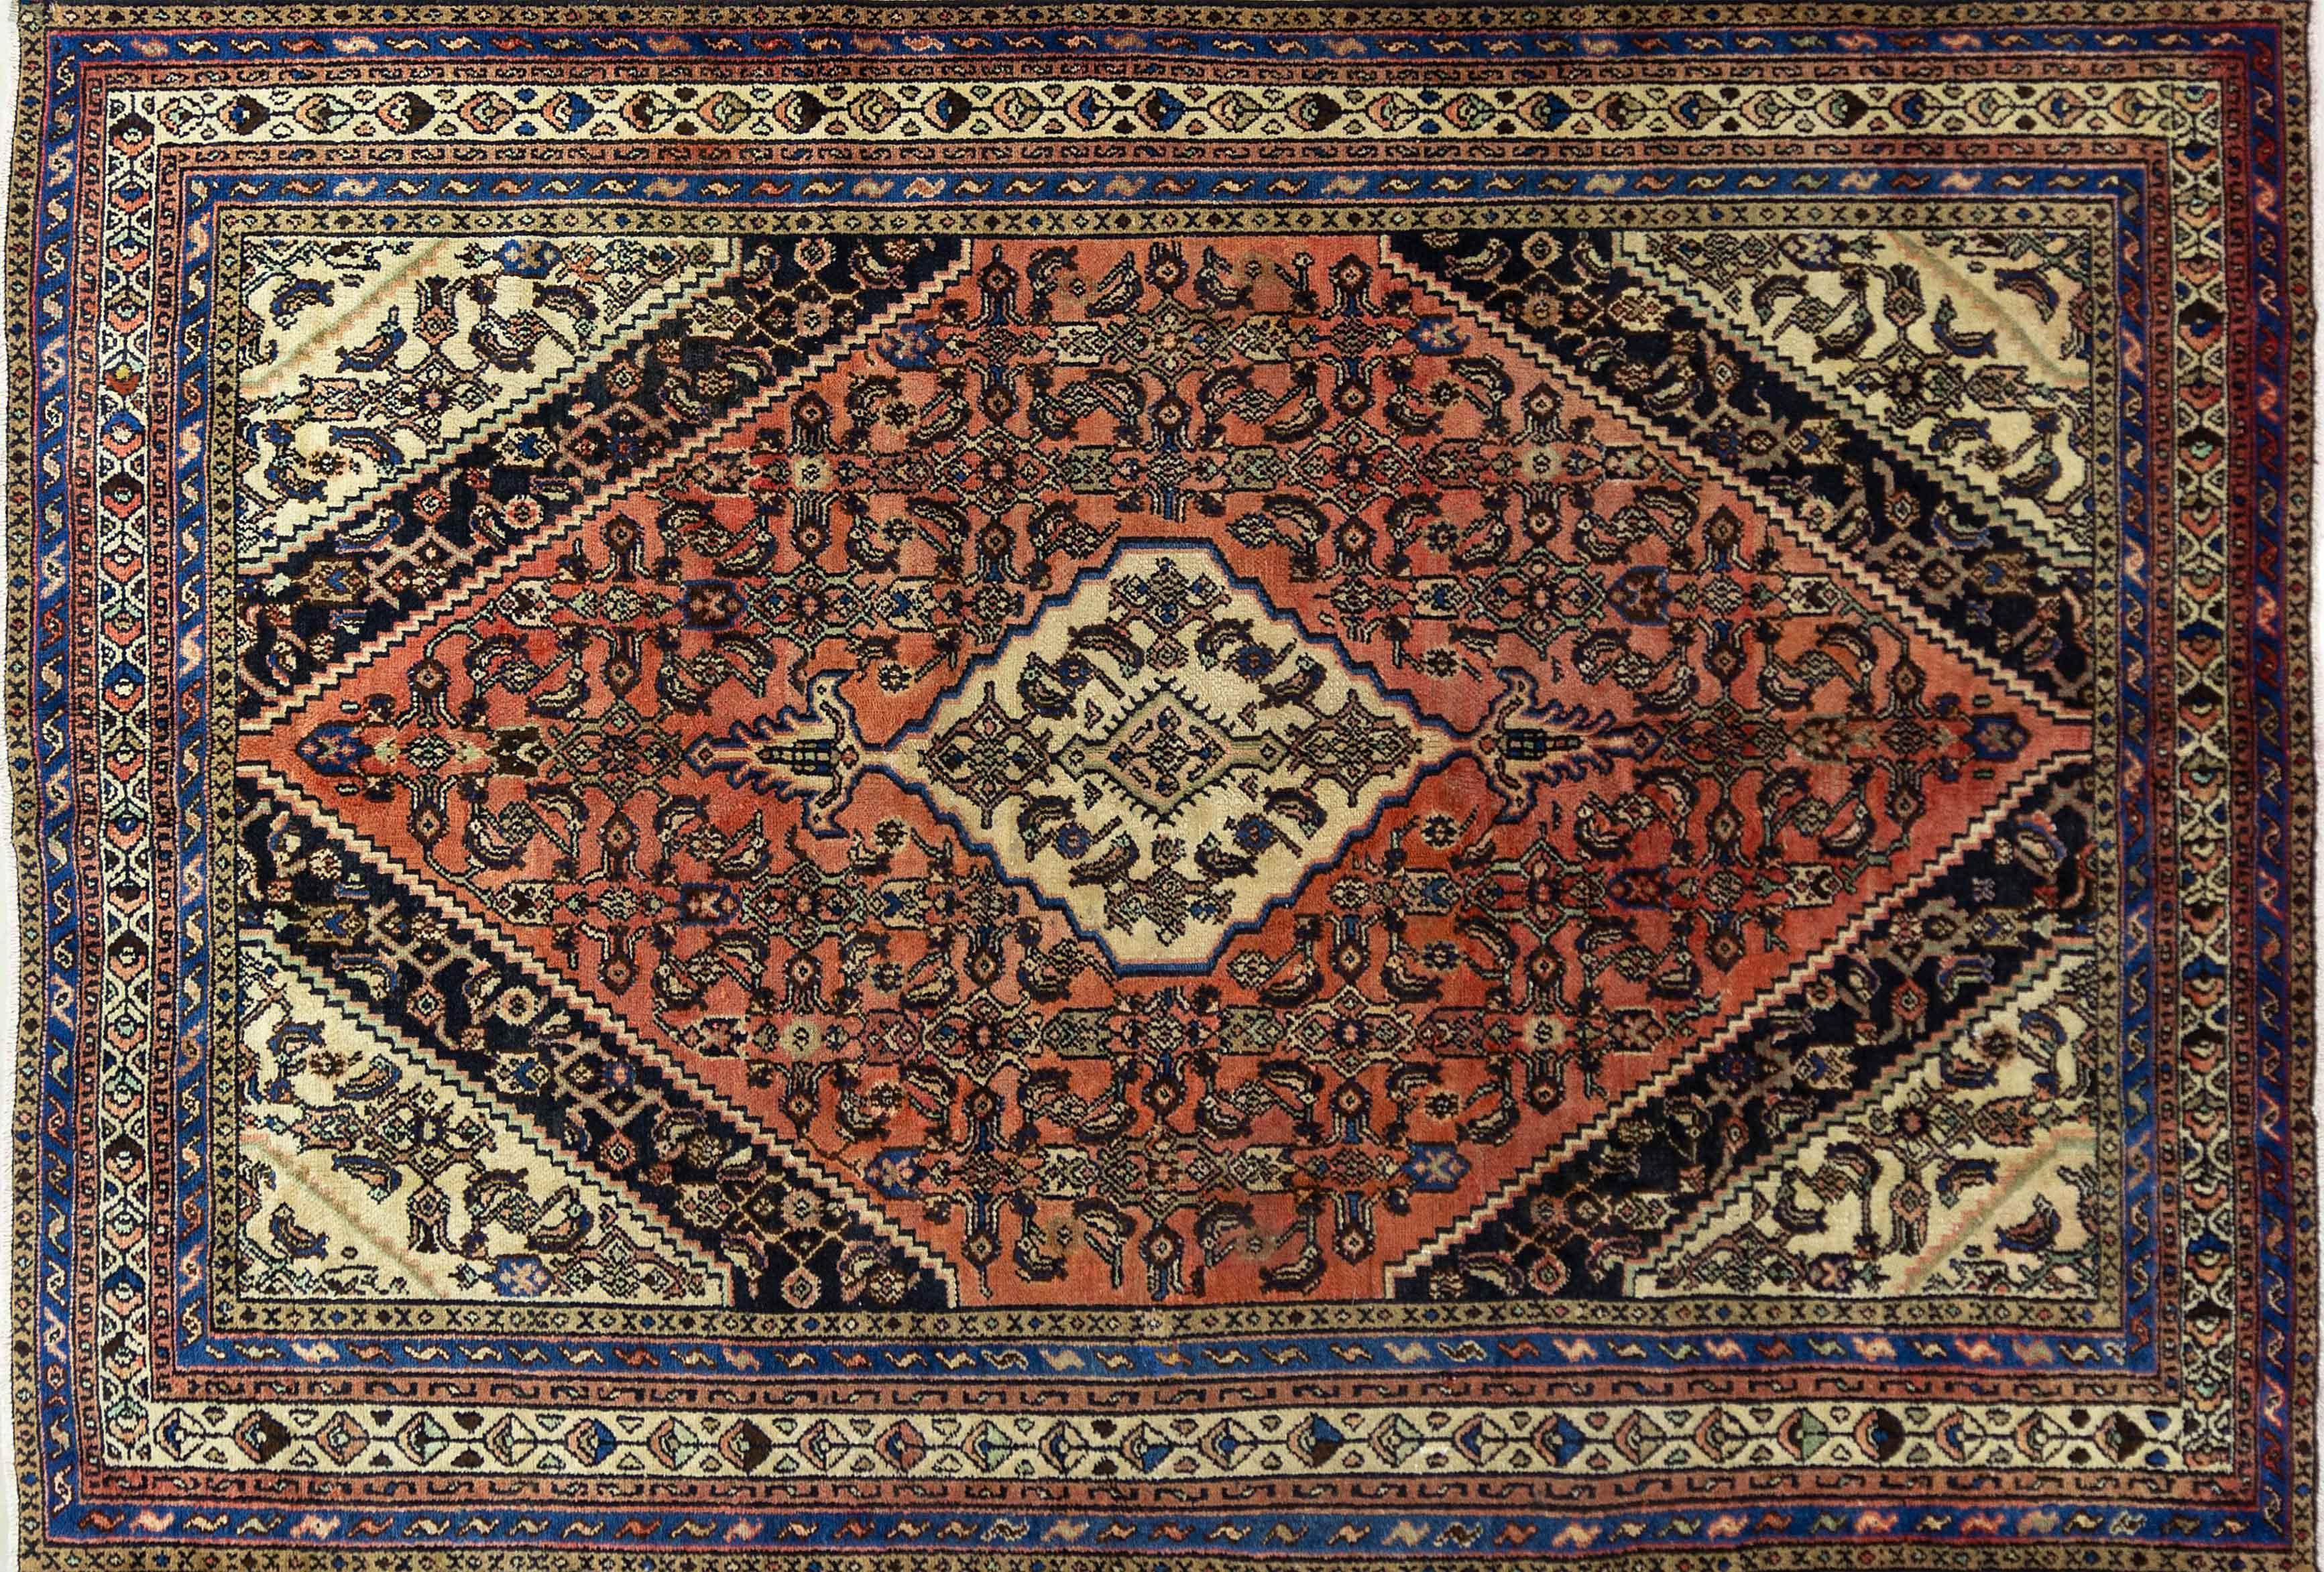 A Persian Hand Knotted Hamadan Carpet, 310 X 207